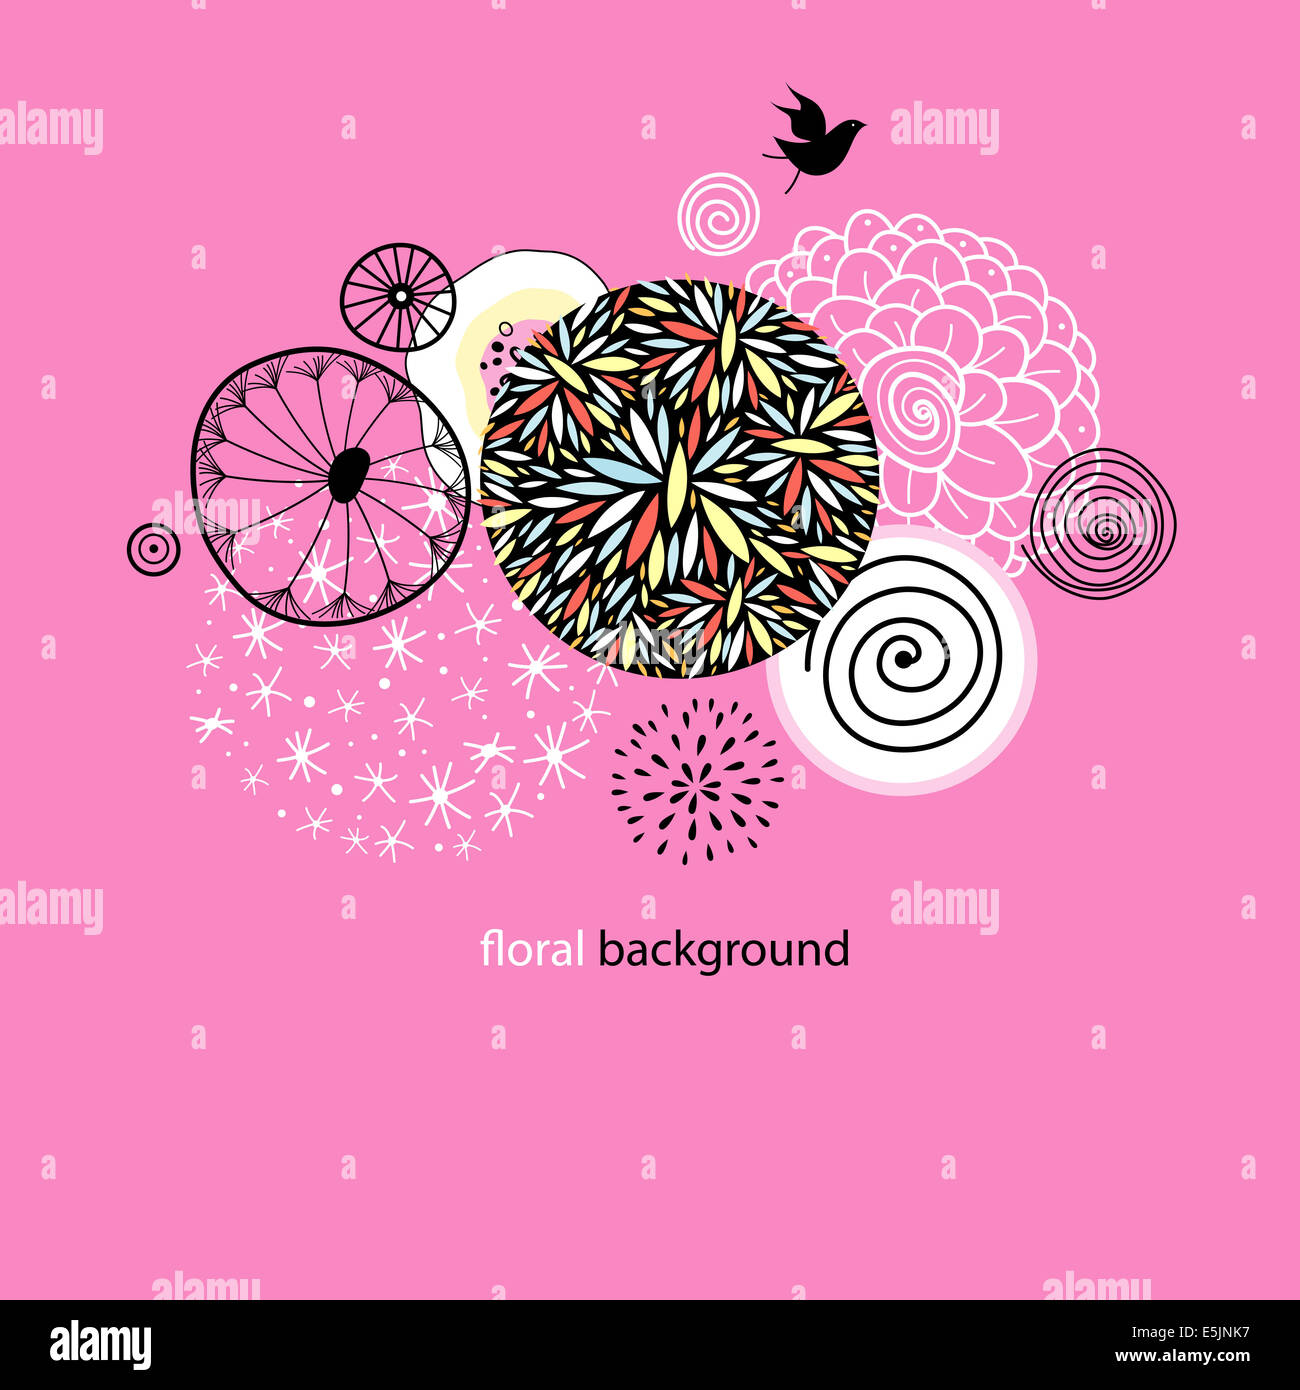 Beautiful designs of flowers and birds stock photo 72326891 alamy beautiful designs of flowers and birds izmirmasajfo